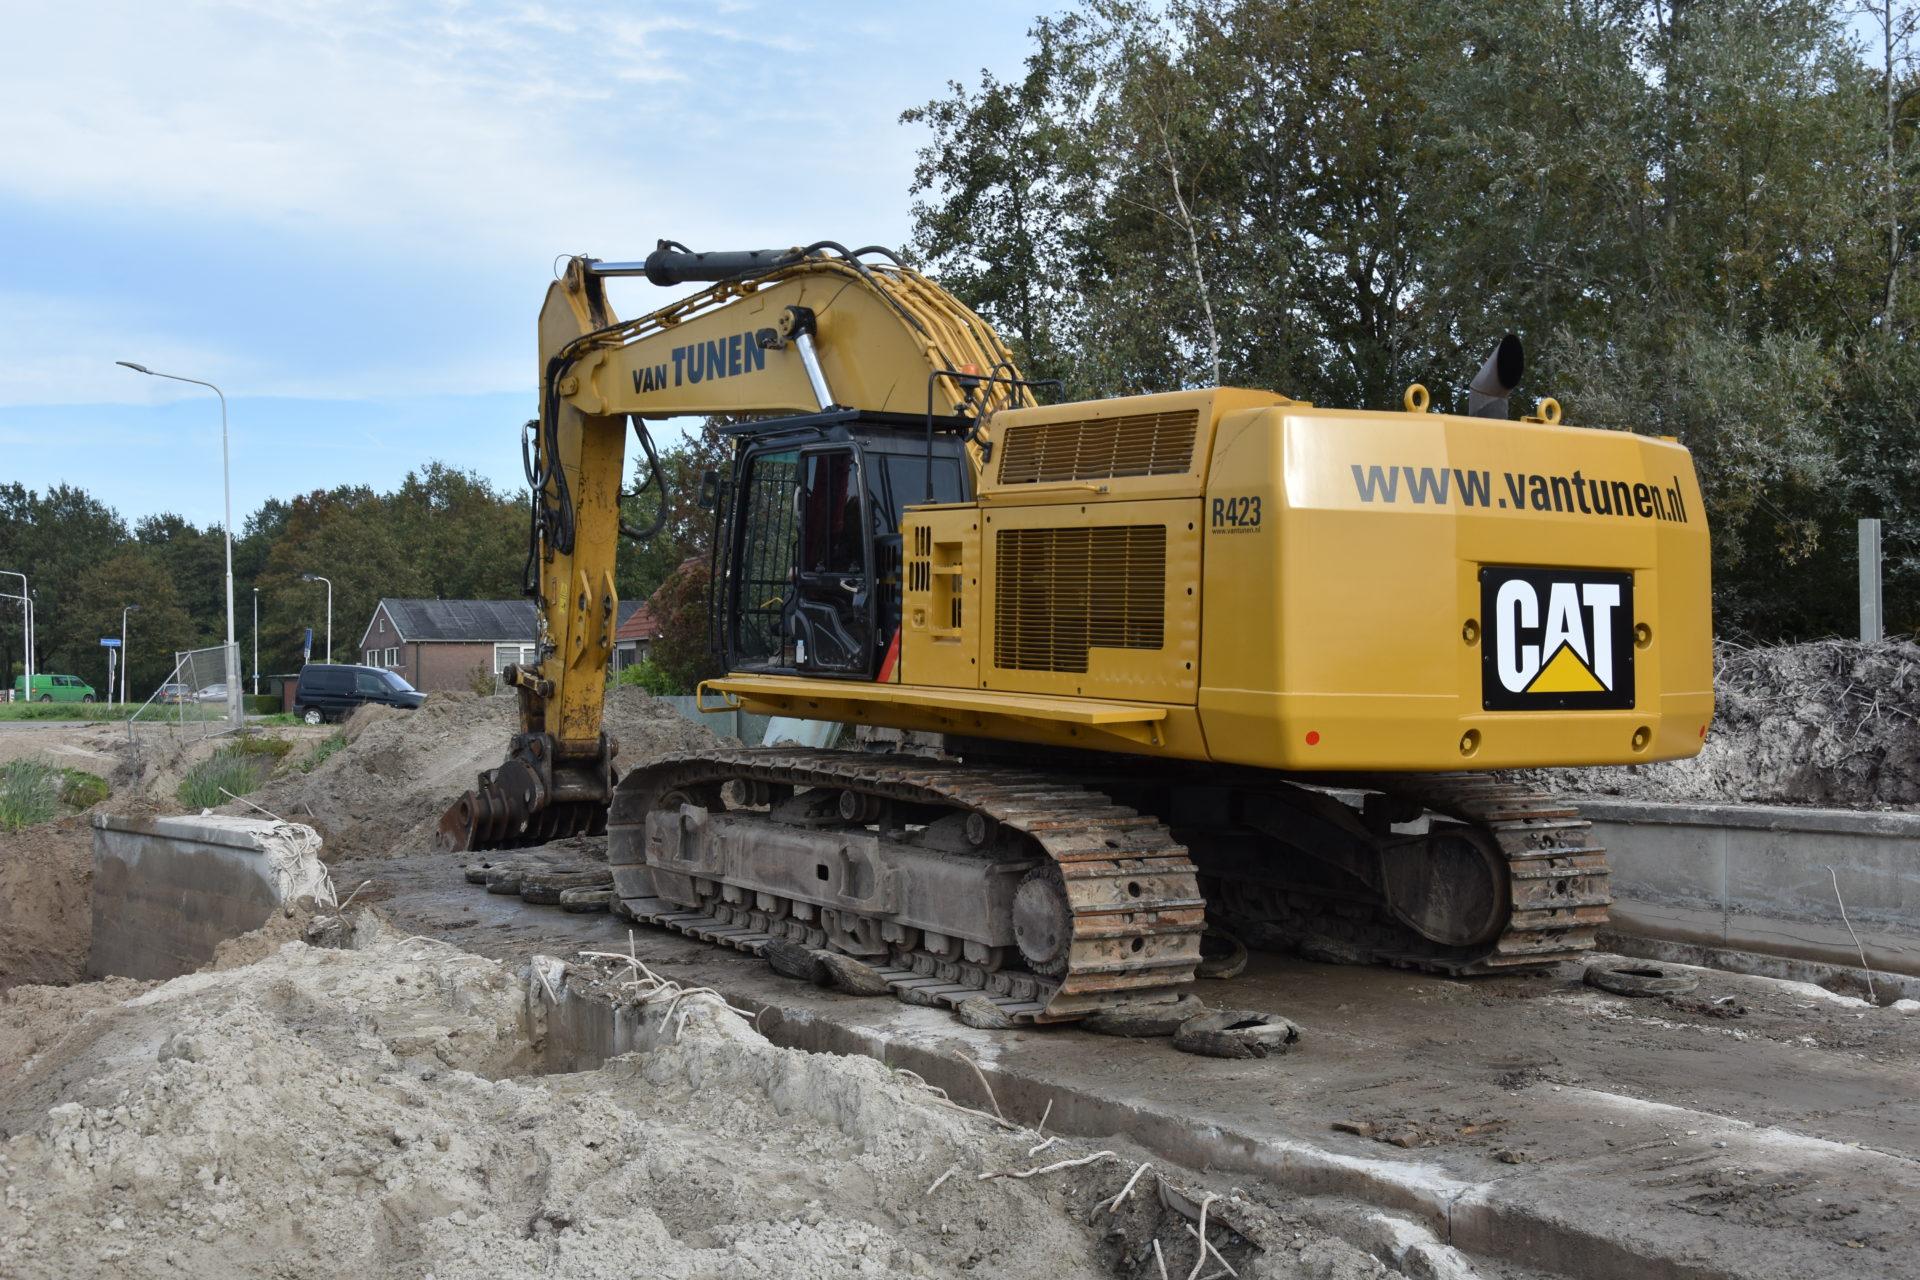 09/2018 Demolition project Joure, the Netherlands